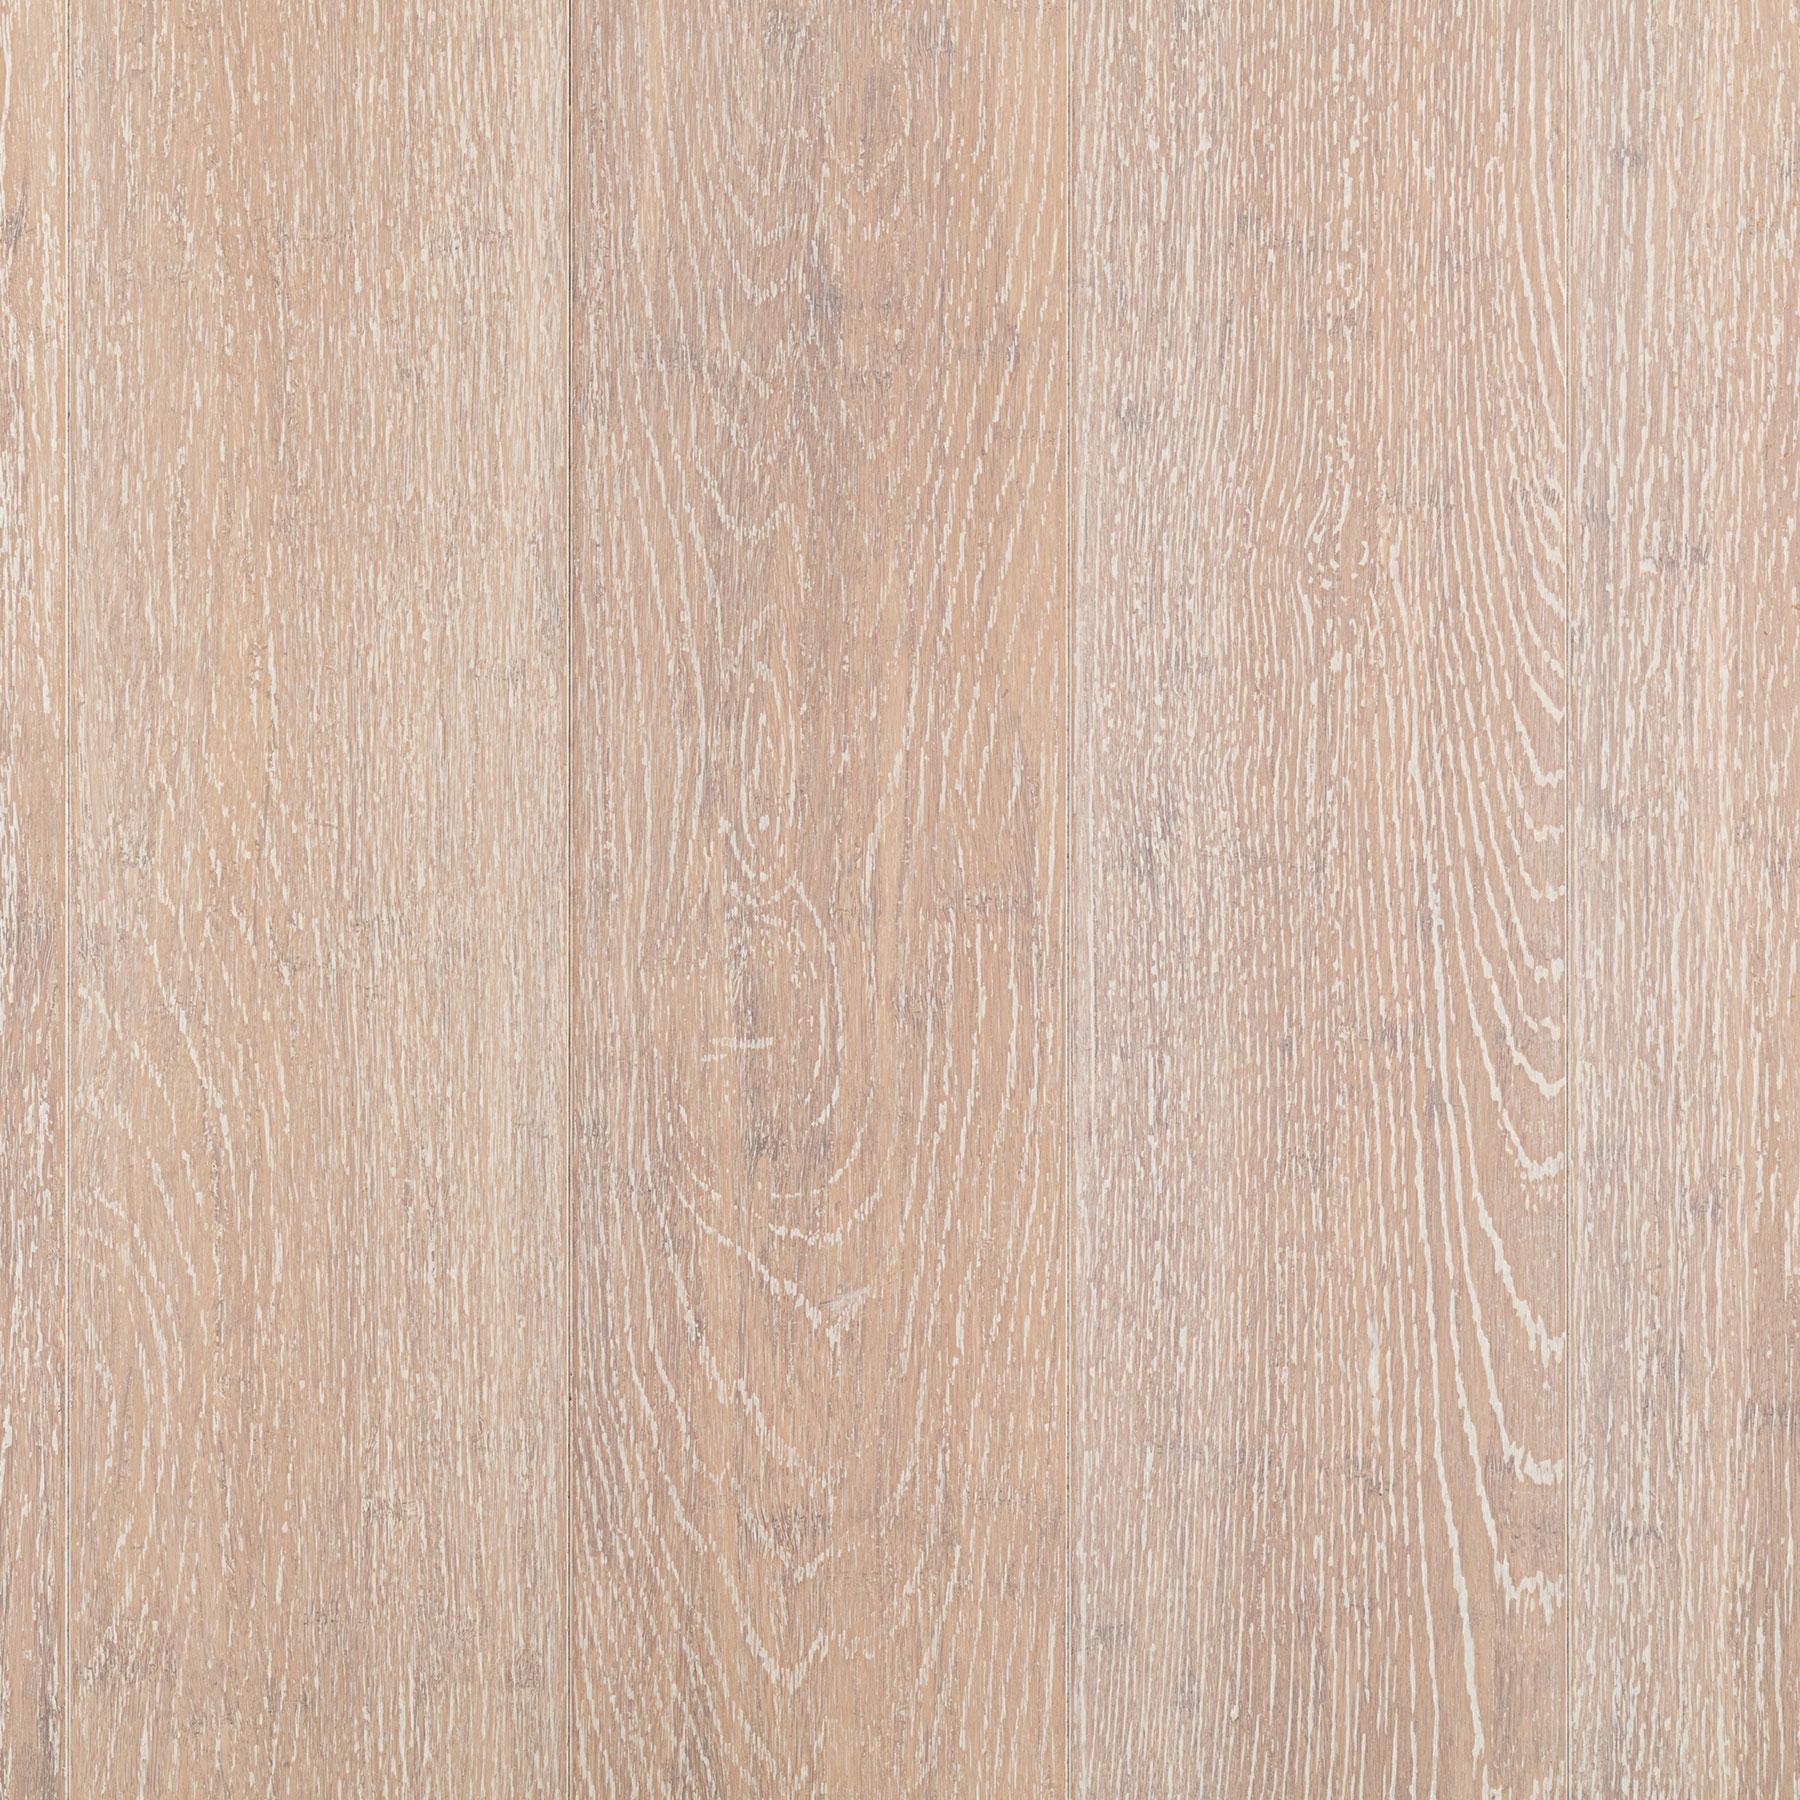 Stranded Bamboo Flooring Hardness